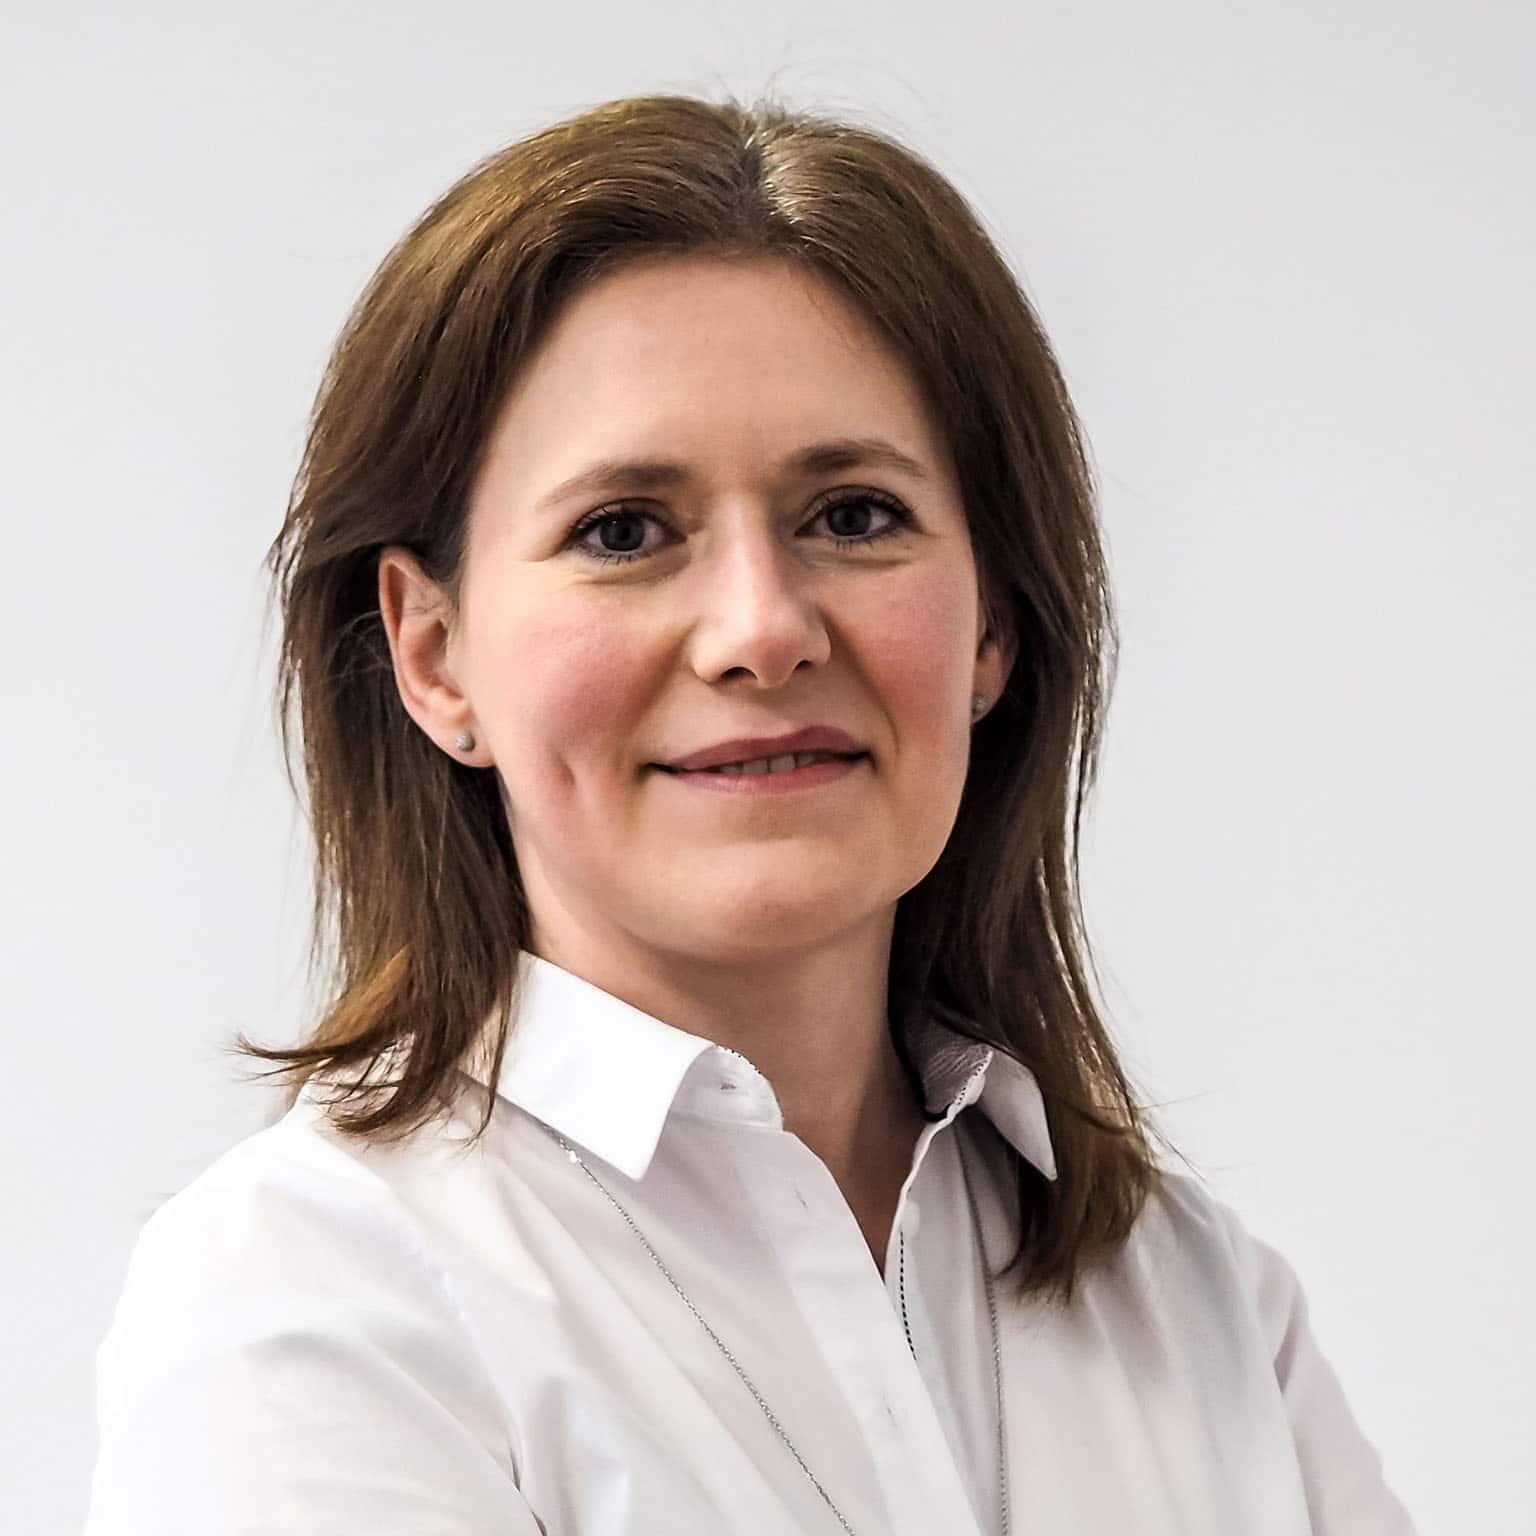 Magdalena Faligowska